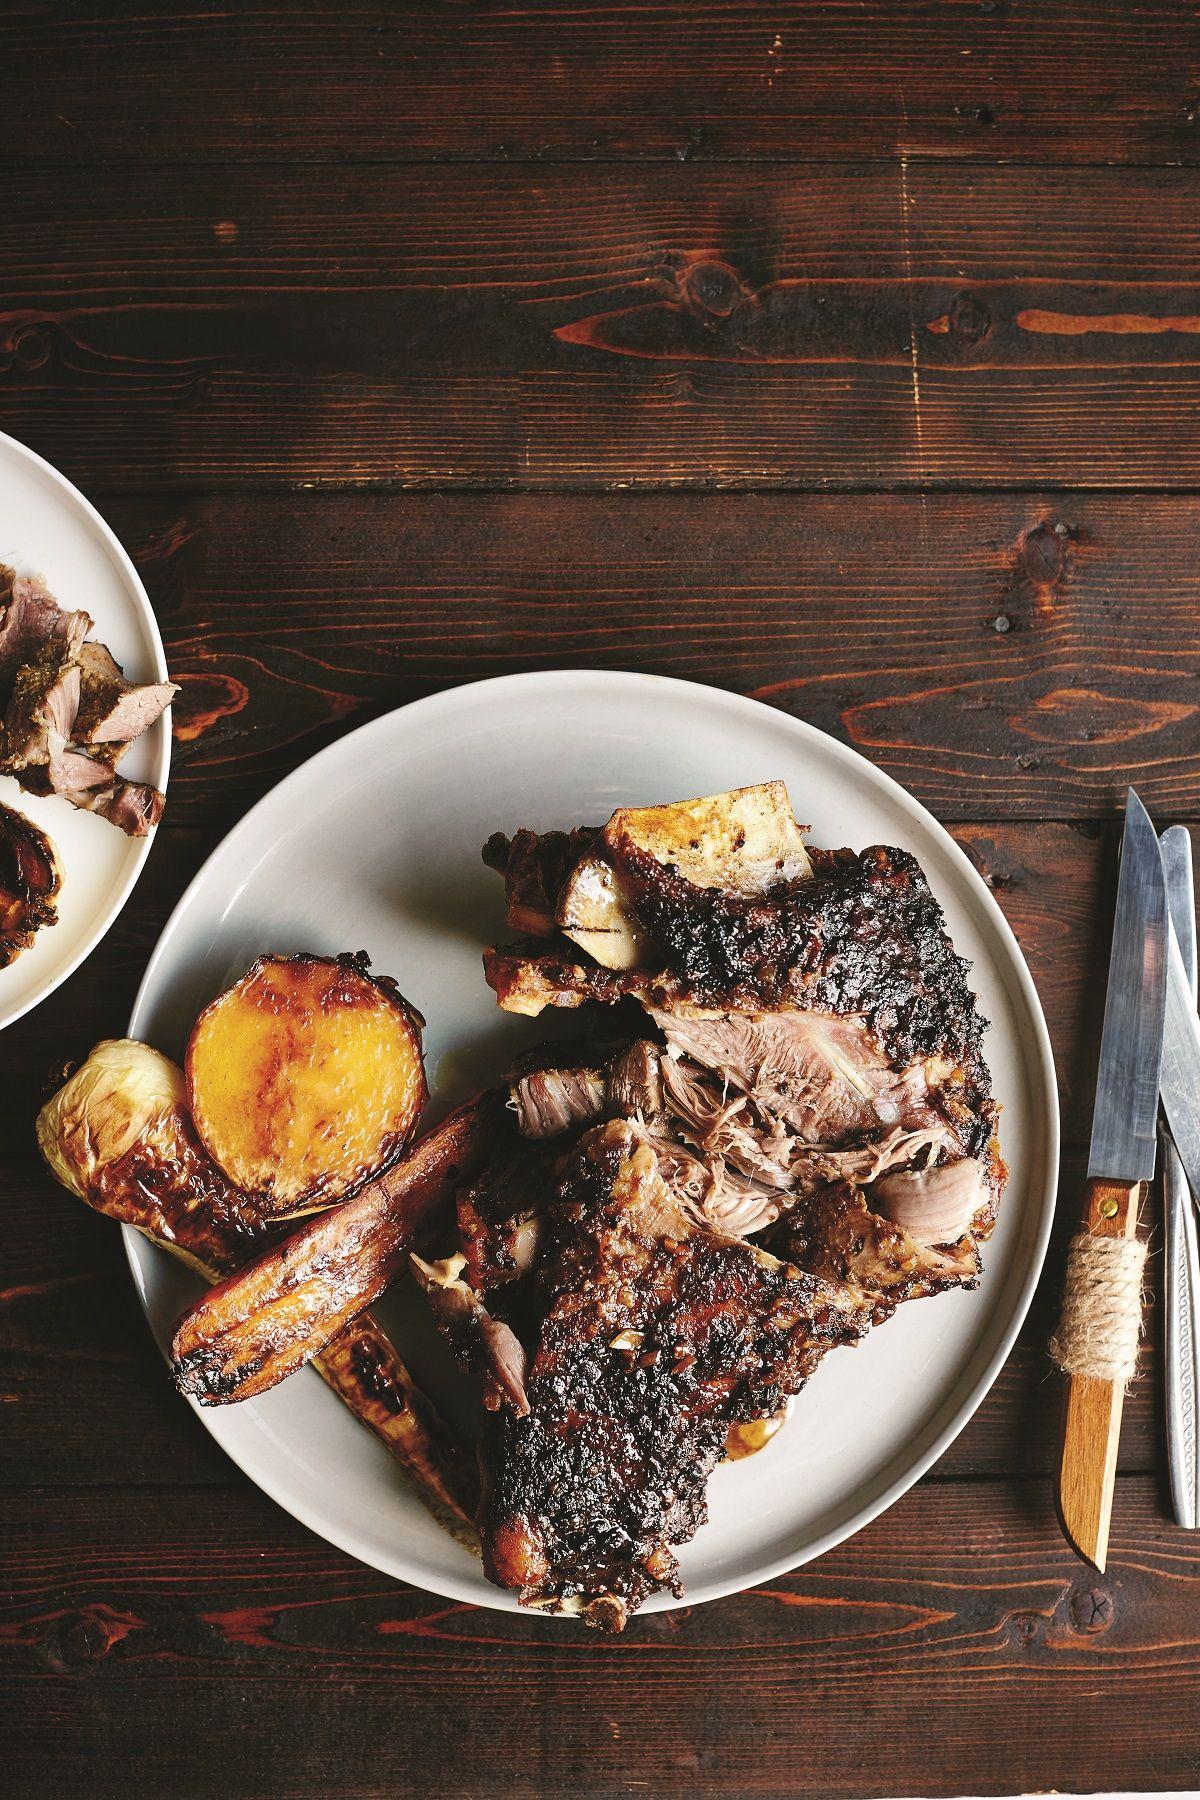 REBLOGGED - Slow-roasted goat shoulder #recipe | MEAT That ...